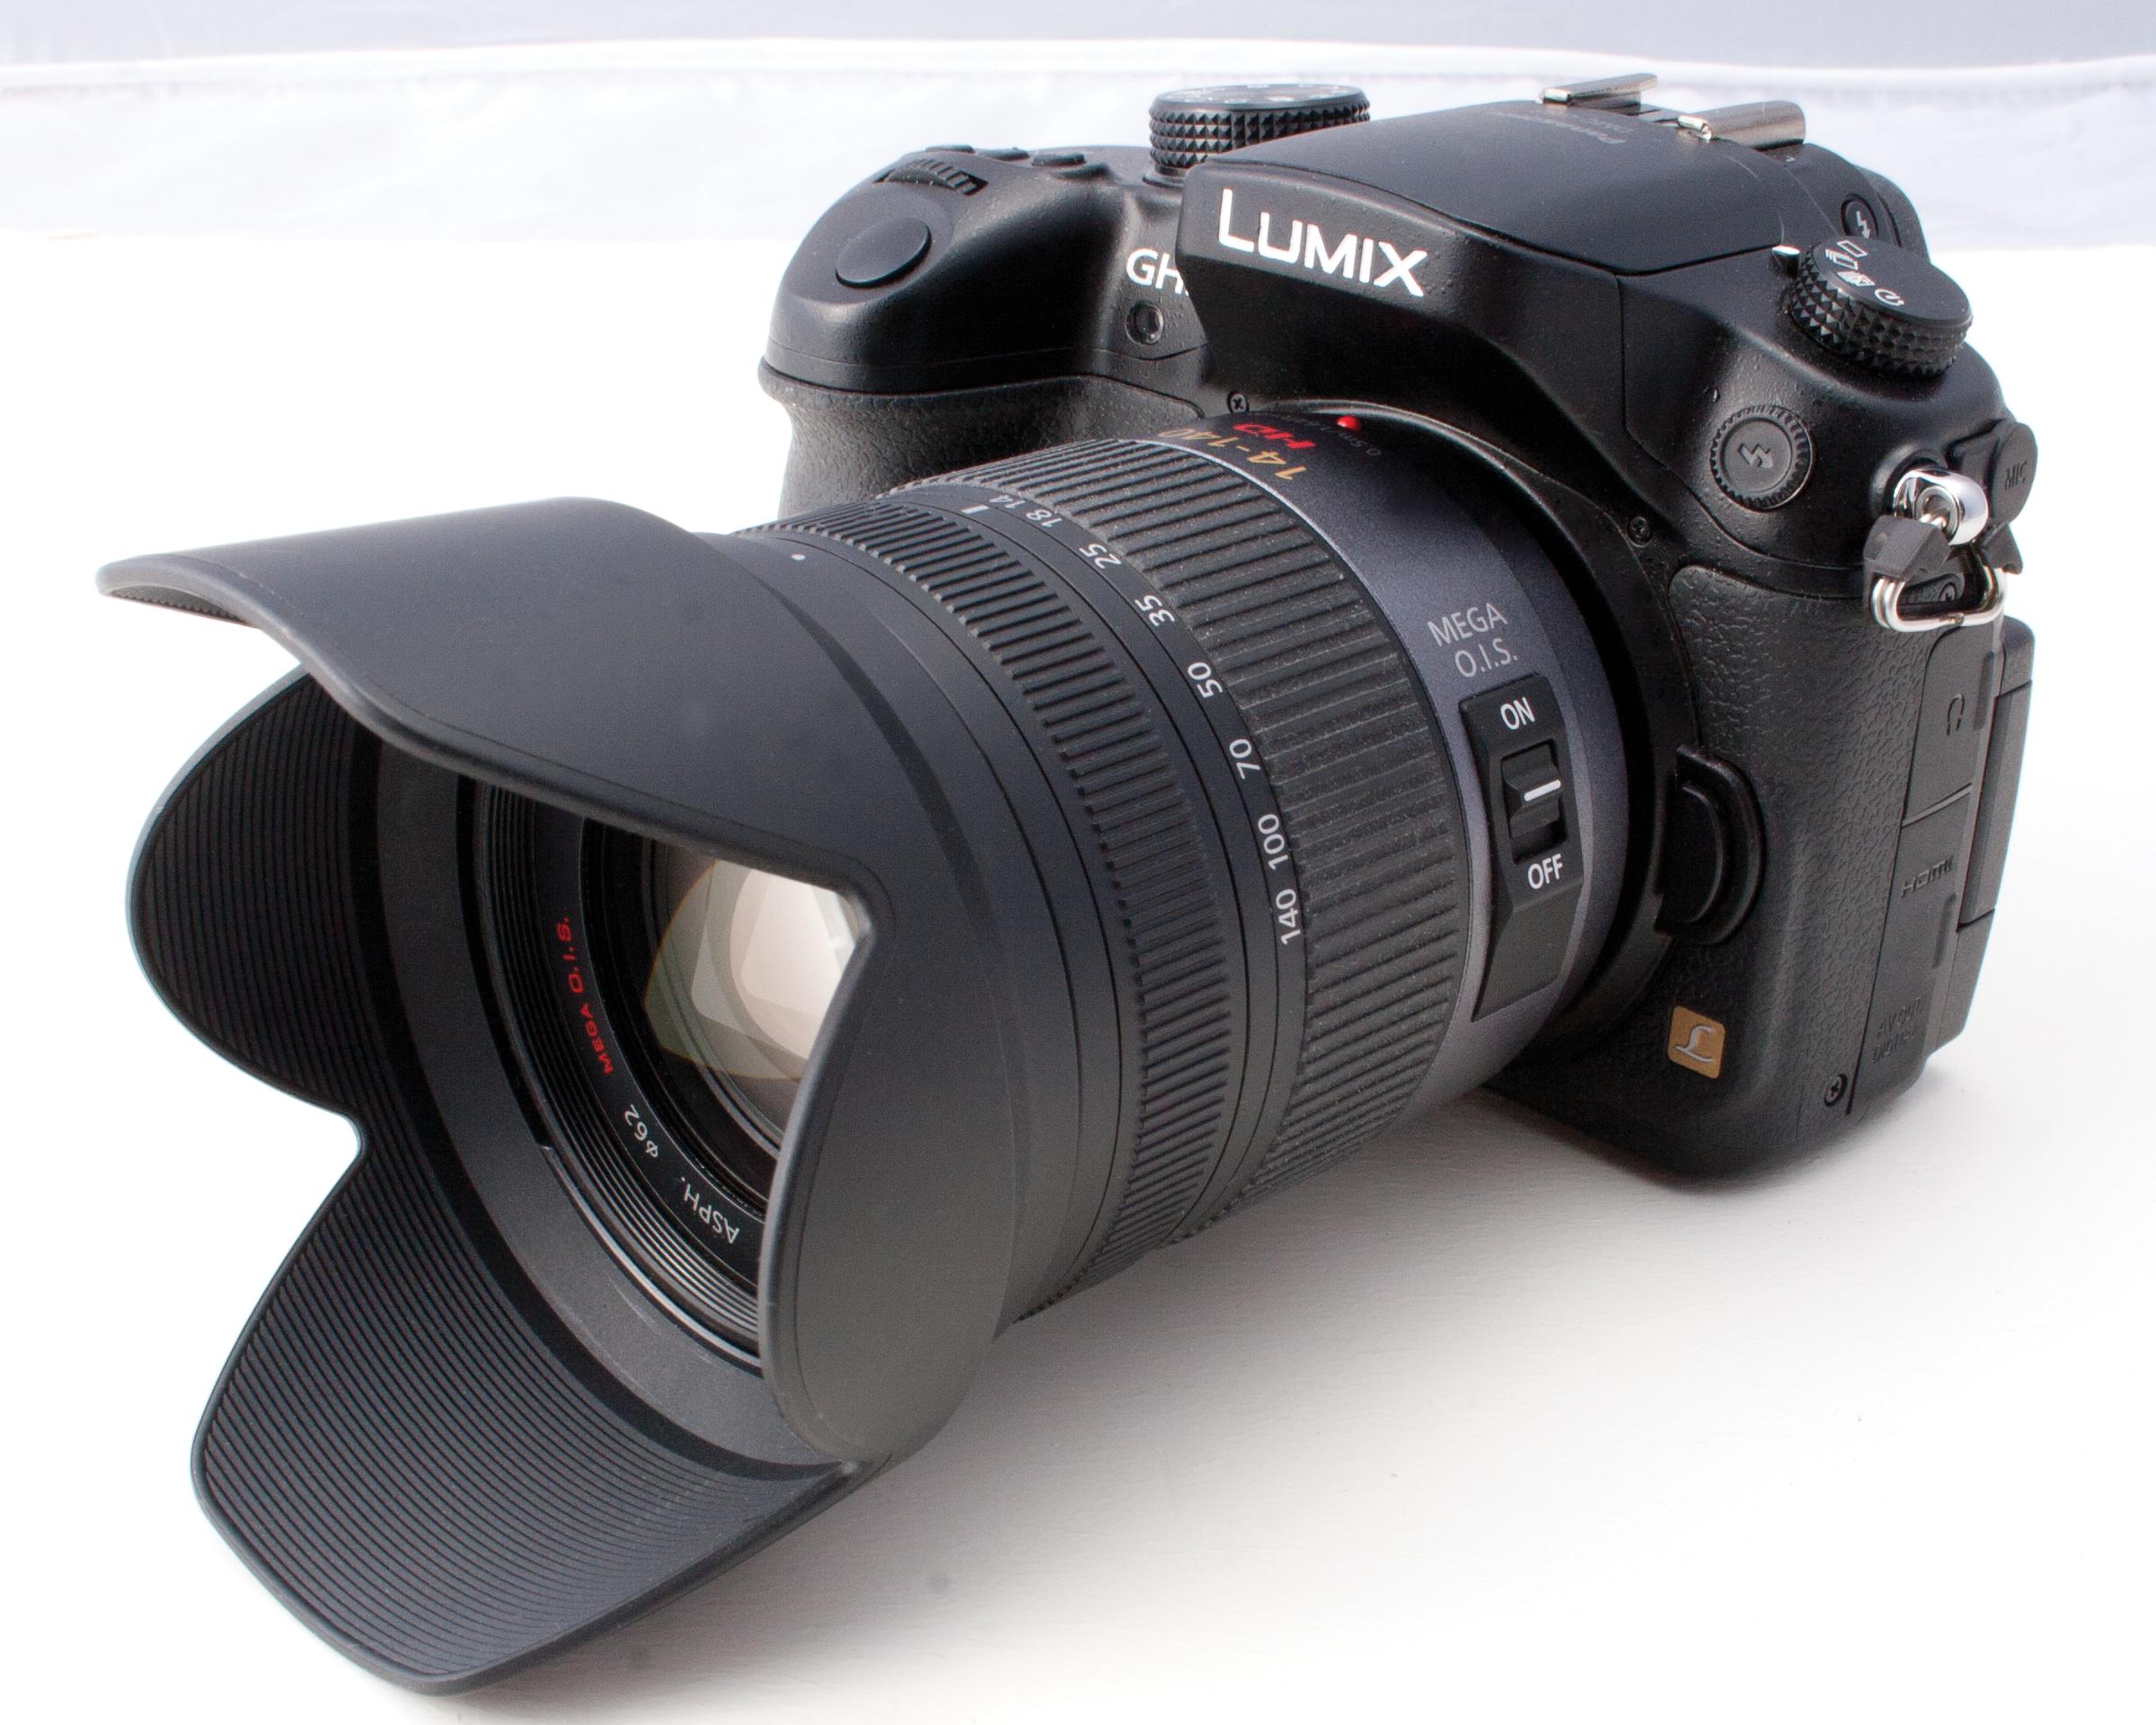 Camera Panasonic Dslr Video Camera panasonic lumix dmc gh3 dslr review videomaker com